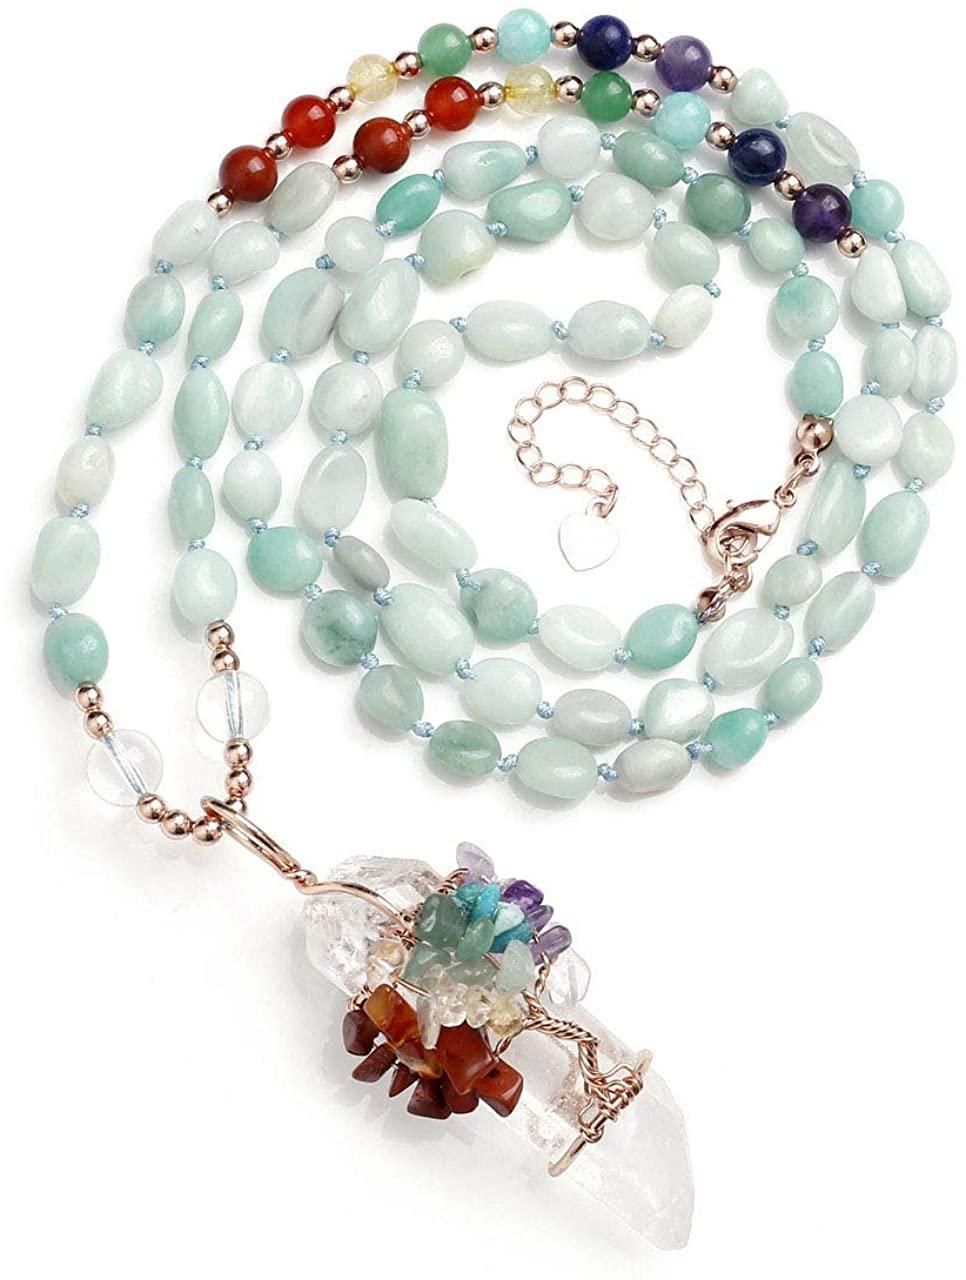 JOVIVI Natural Amethyst Rose Quartz Chakras Gemstone Healing Crystals Necklace Wire Wrapped Irregular Raw Clear Quartz Tree of Life Pendant Healing Pointed Reiki Energy Balancing